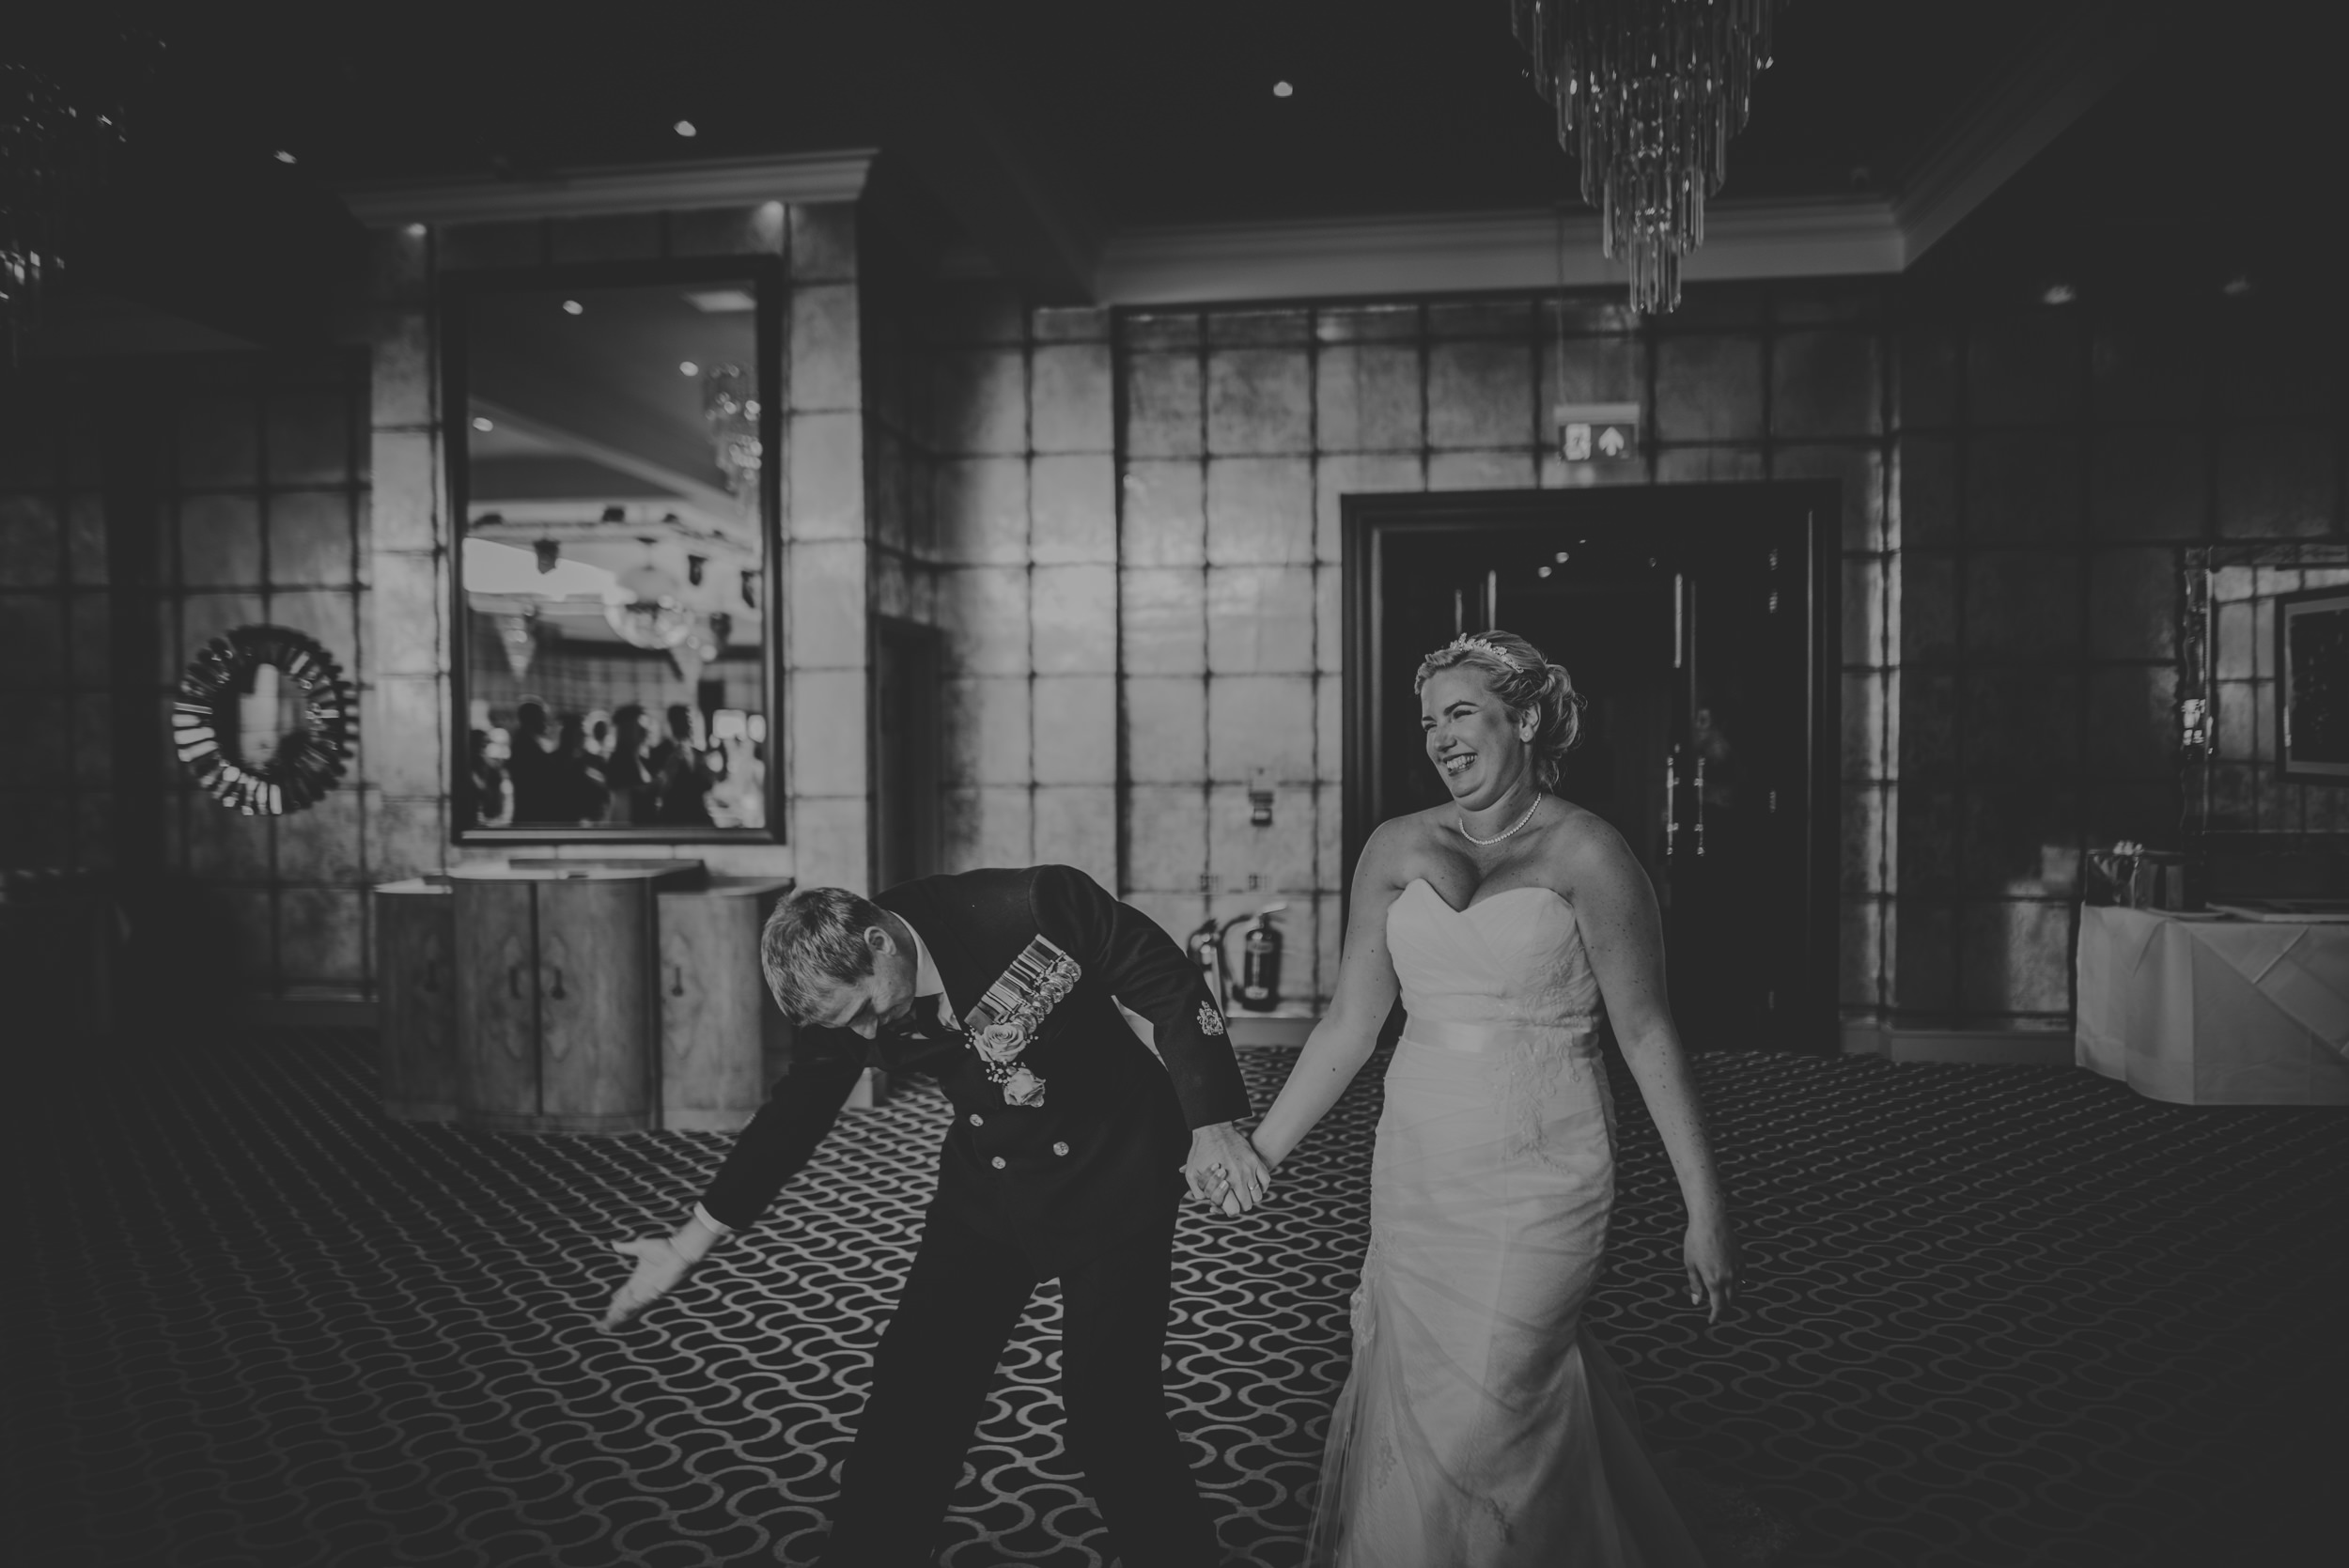 Chantelle-and-Stephen-Old-Thorns-Hotel-Wedding-Liphook-Manu-Mendoza-Wedding-Photography-342.jpg